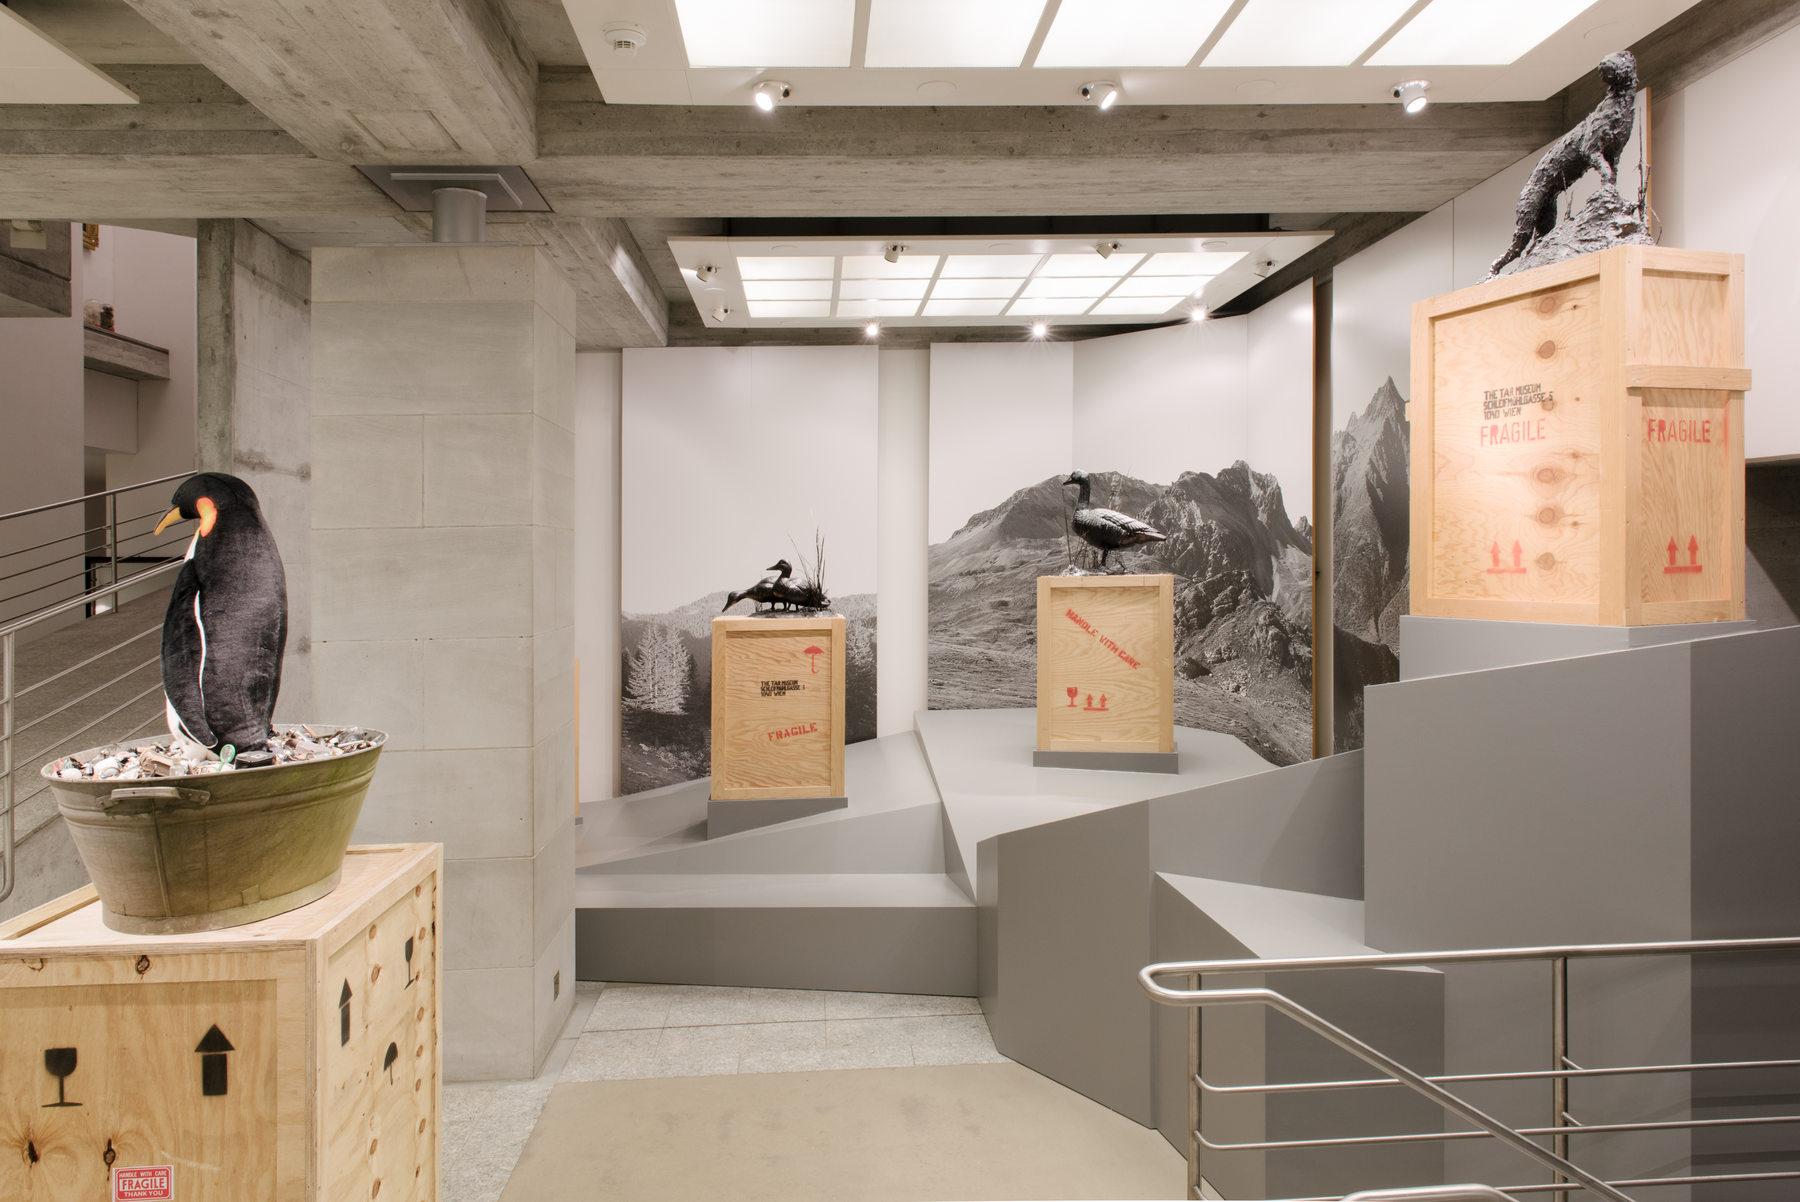 02_Installationsansicht_St.Gallen__Foto_Sebastian_Stadler